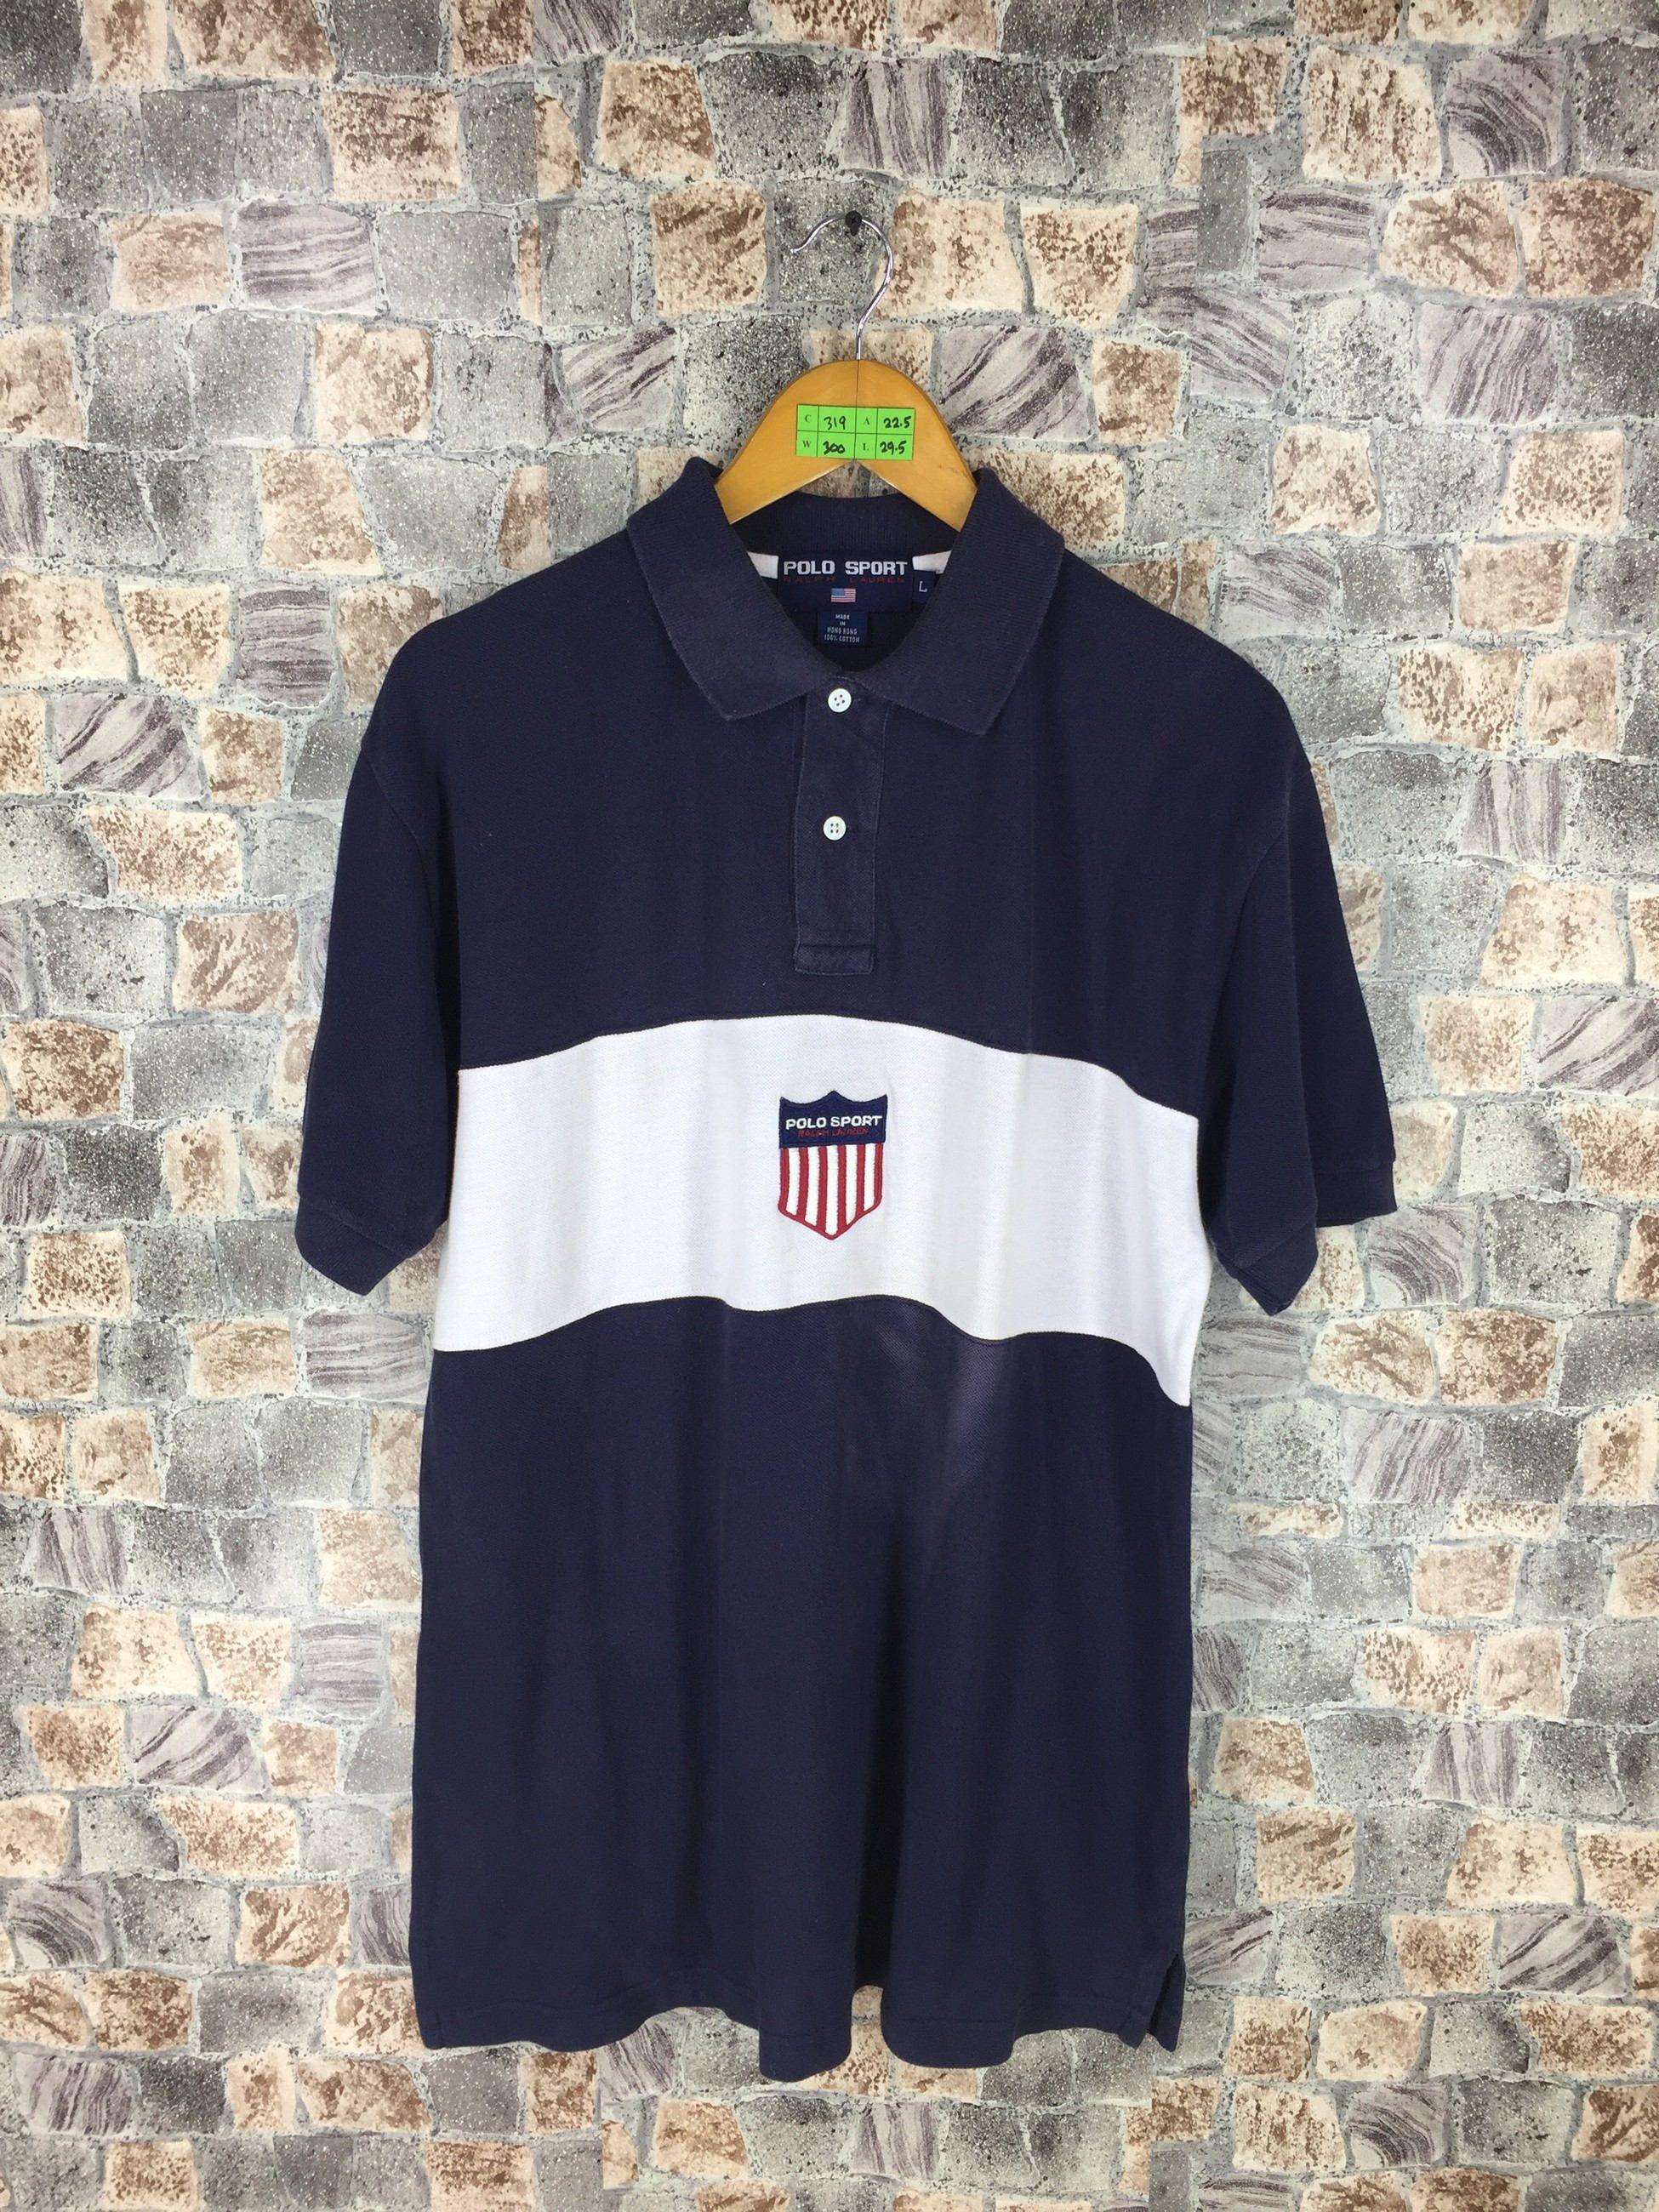 Vintage US POLO Ralph Lauren Usa Flag Spell Out Stadium92 Sportsman Tshirt XLarge